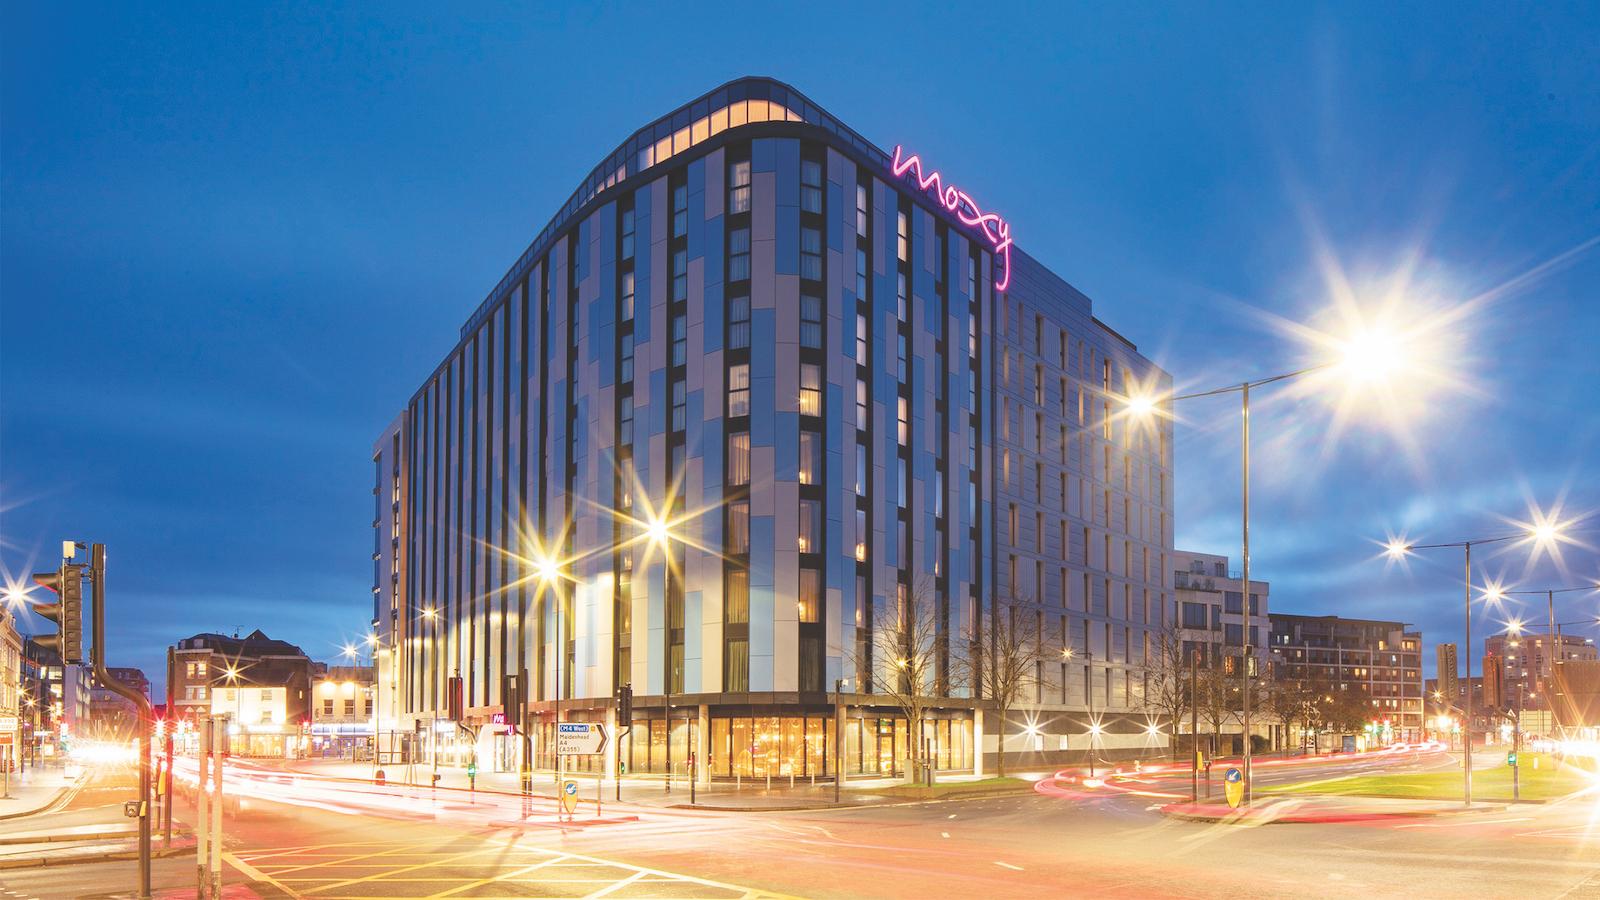 The nine-storey double-decker hotel complex